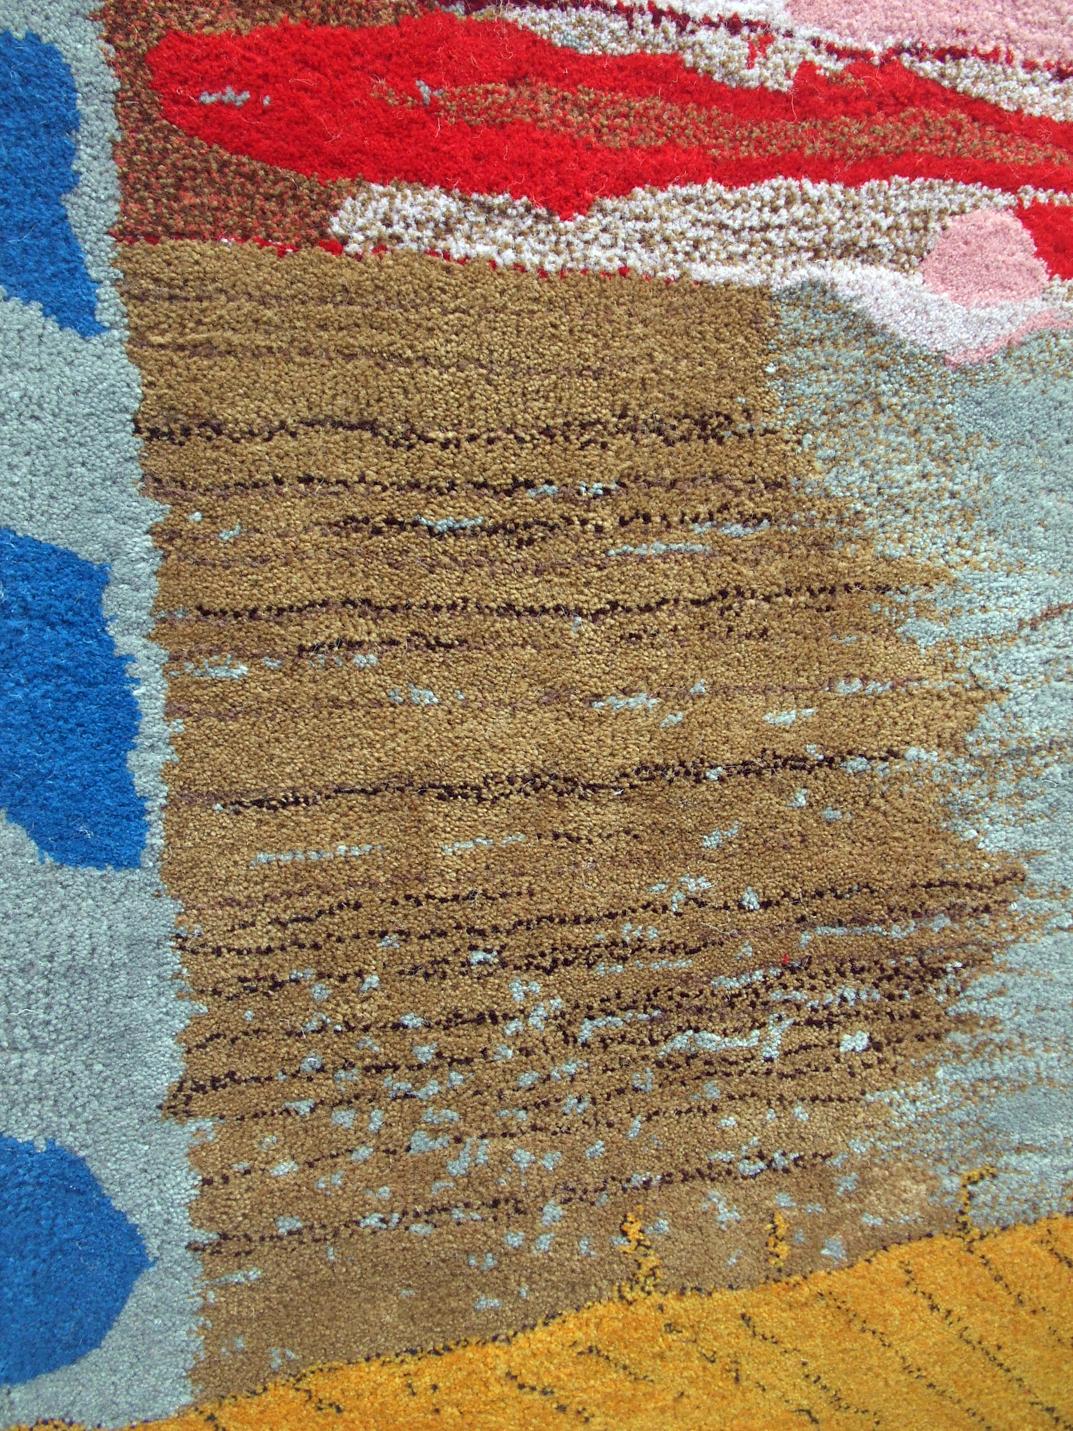 Daniel Beckford (detail) My Life rug